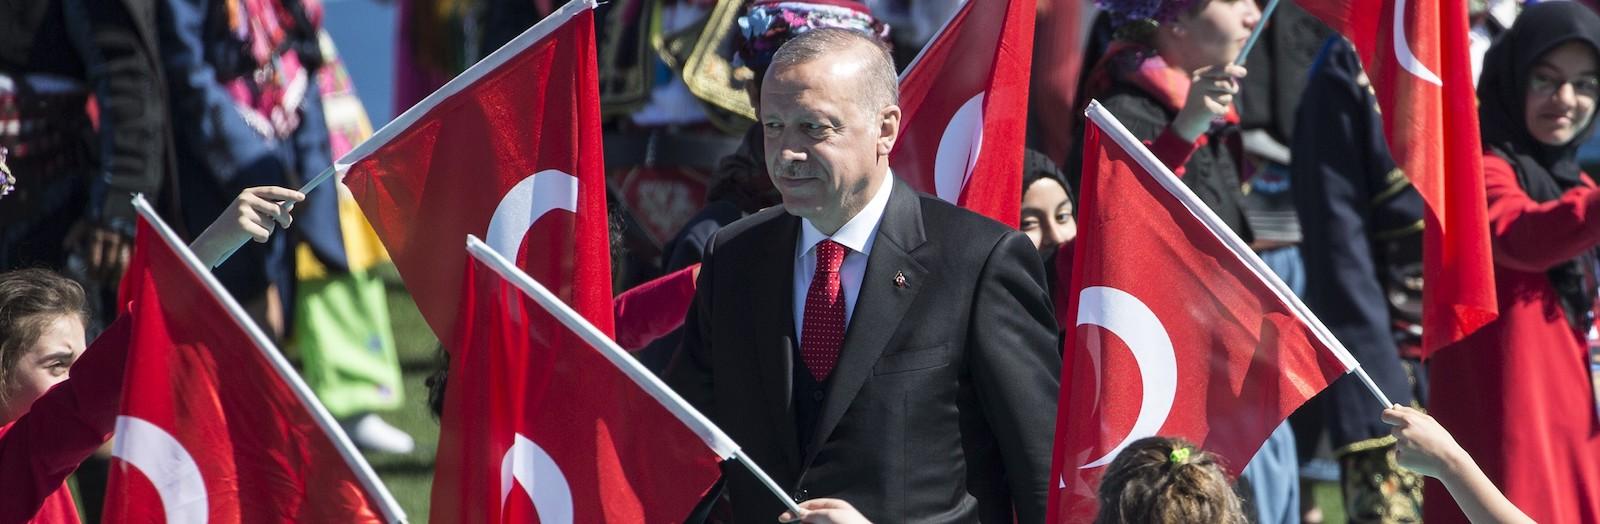 Turkish President Recep Tayyip Erdogan (Photo: Ali Balikci via Getty)